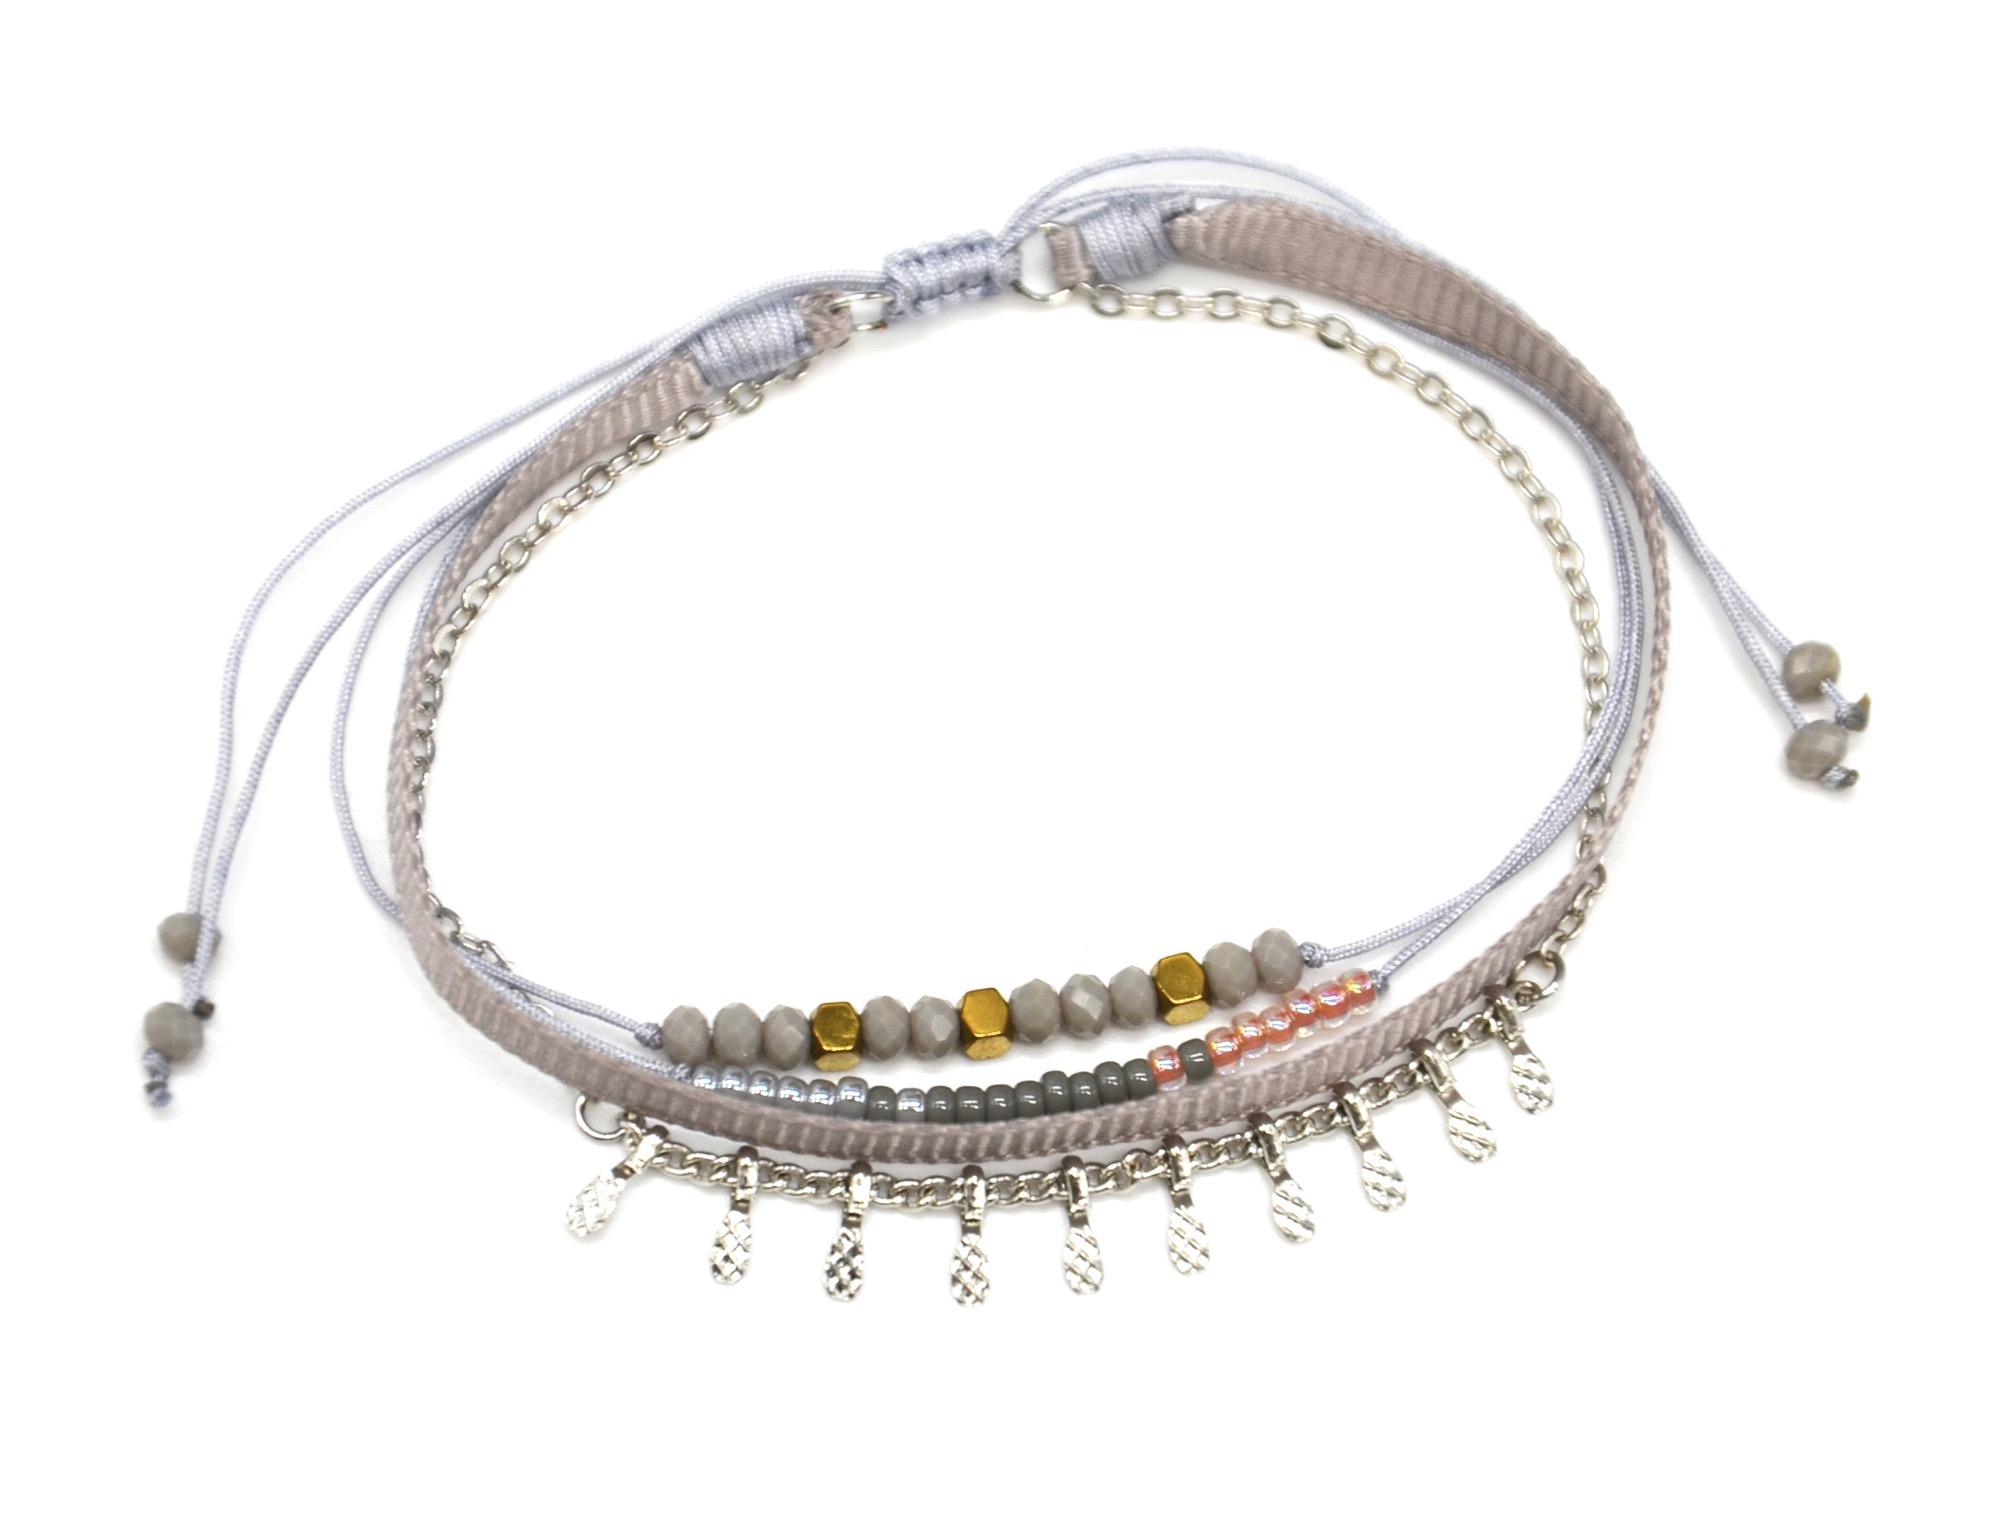 Bc2936f bracelet cordon multi rangs perles pierres et ruban gris avec charm ebay - Bracelet perle et ruban ...